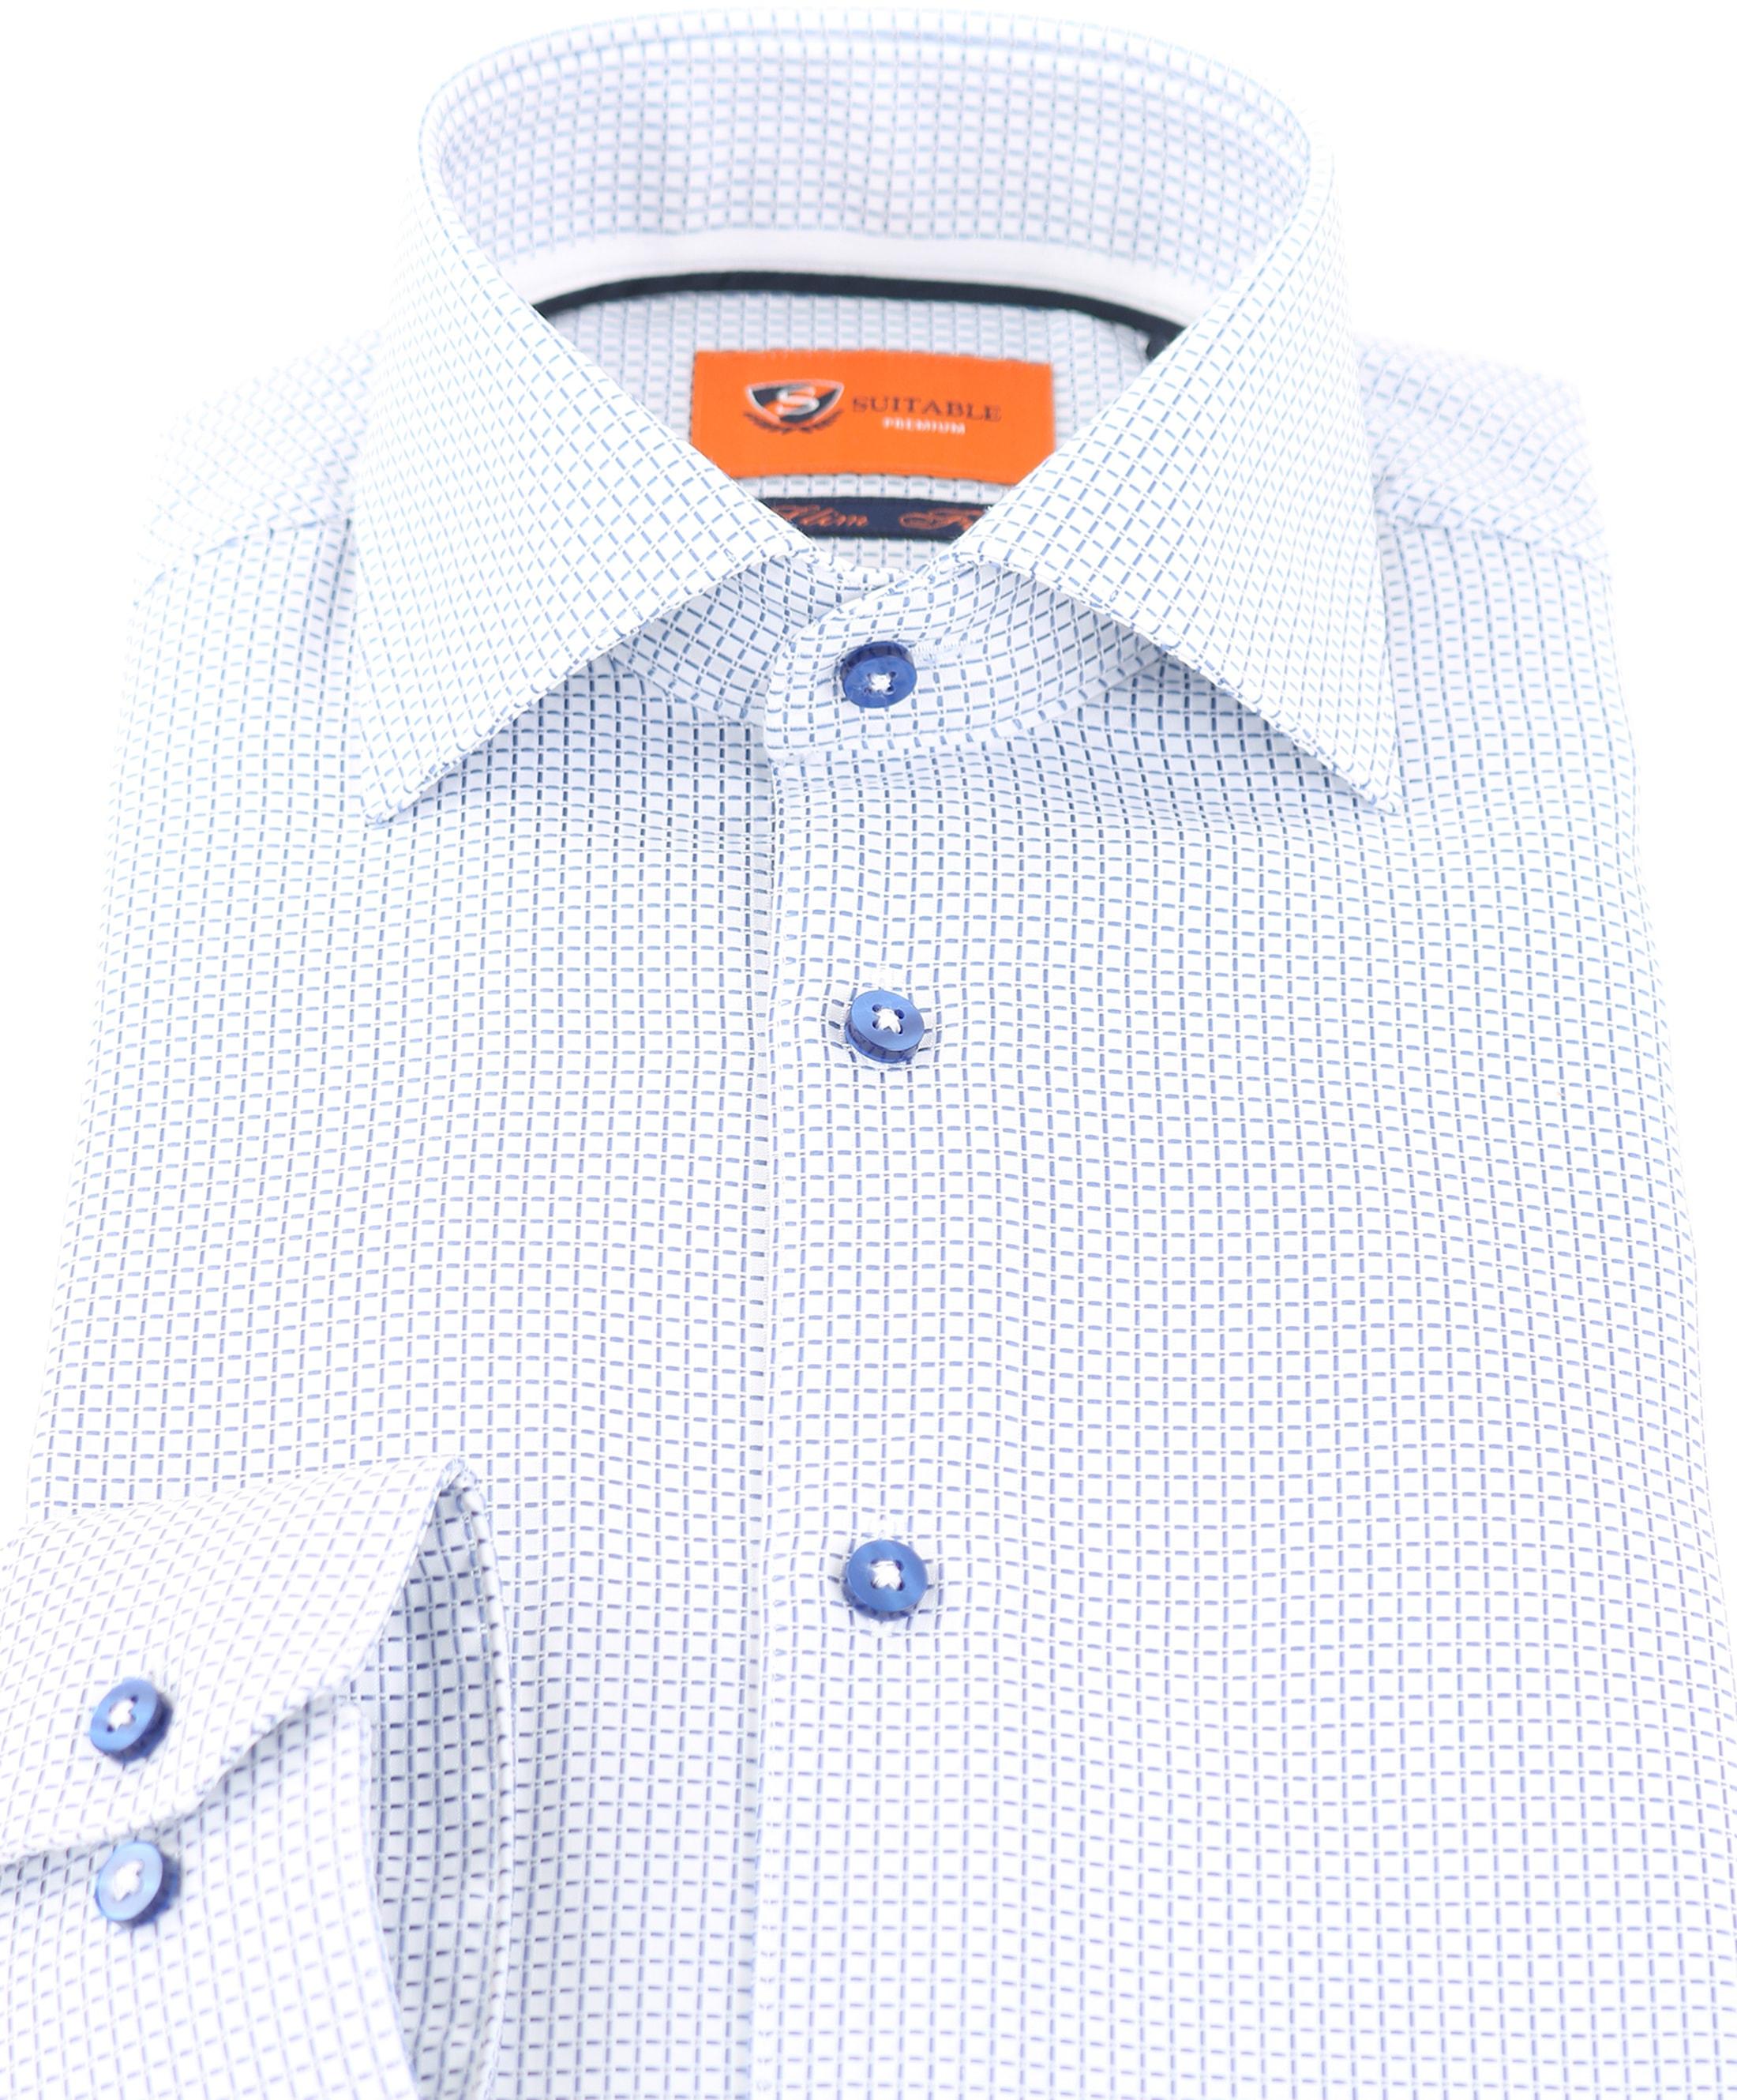 Suitable Overhemd D71-17 foto 1